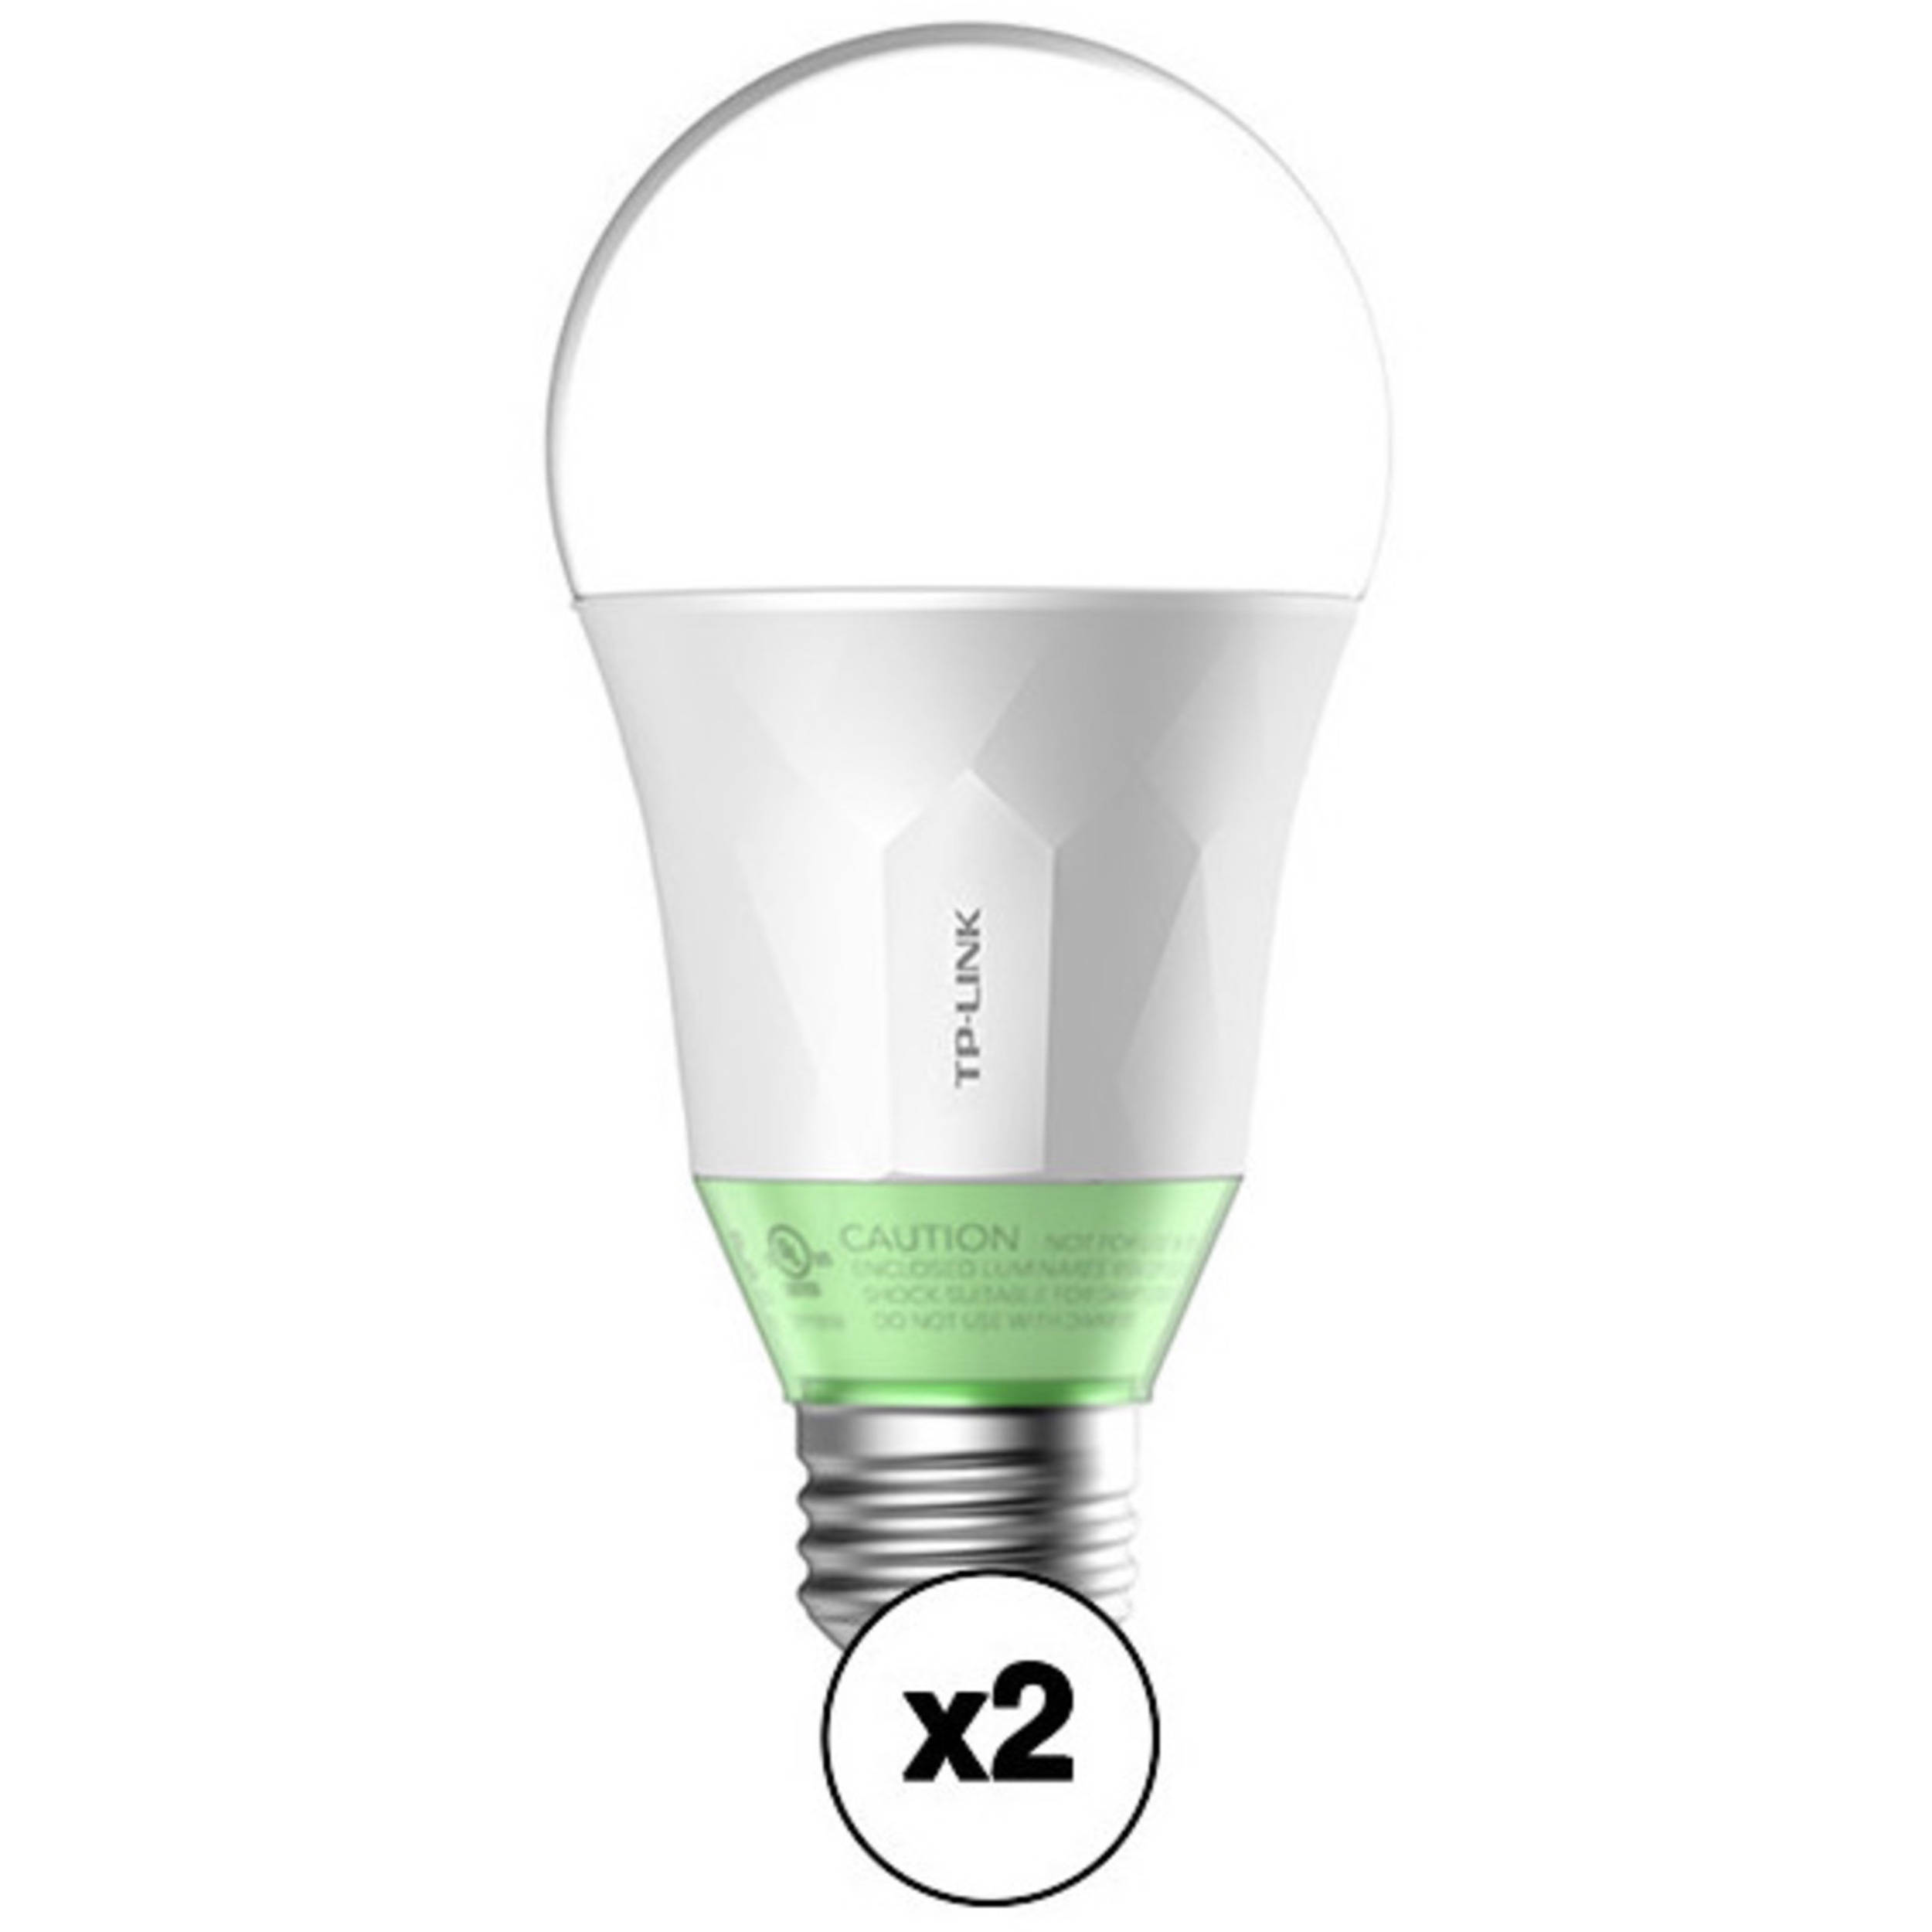 TP-Link LB110 Wi-Fi Smart LED Bulb (2-Pack)